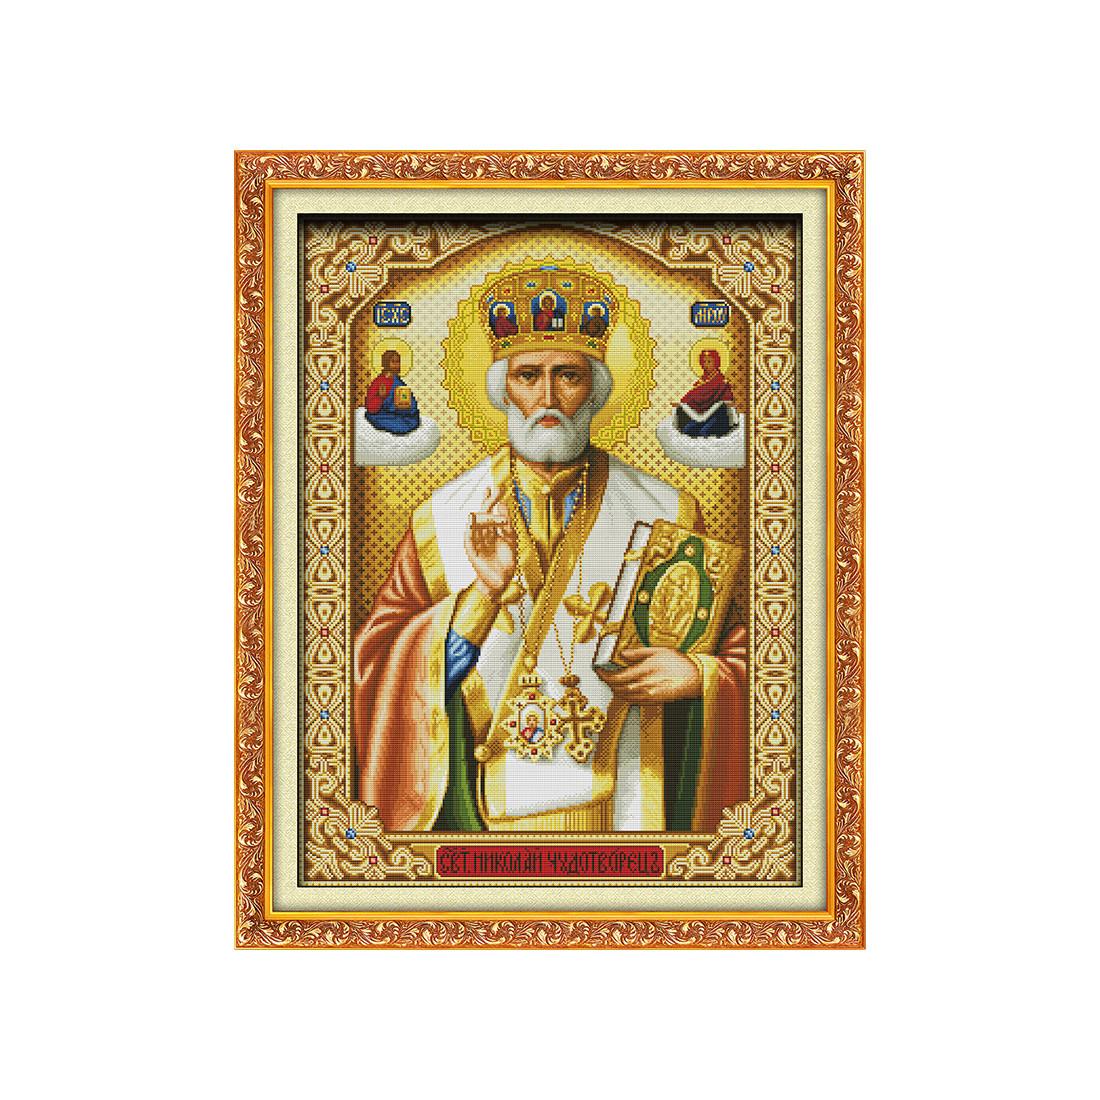 Papież - ikona